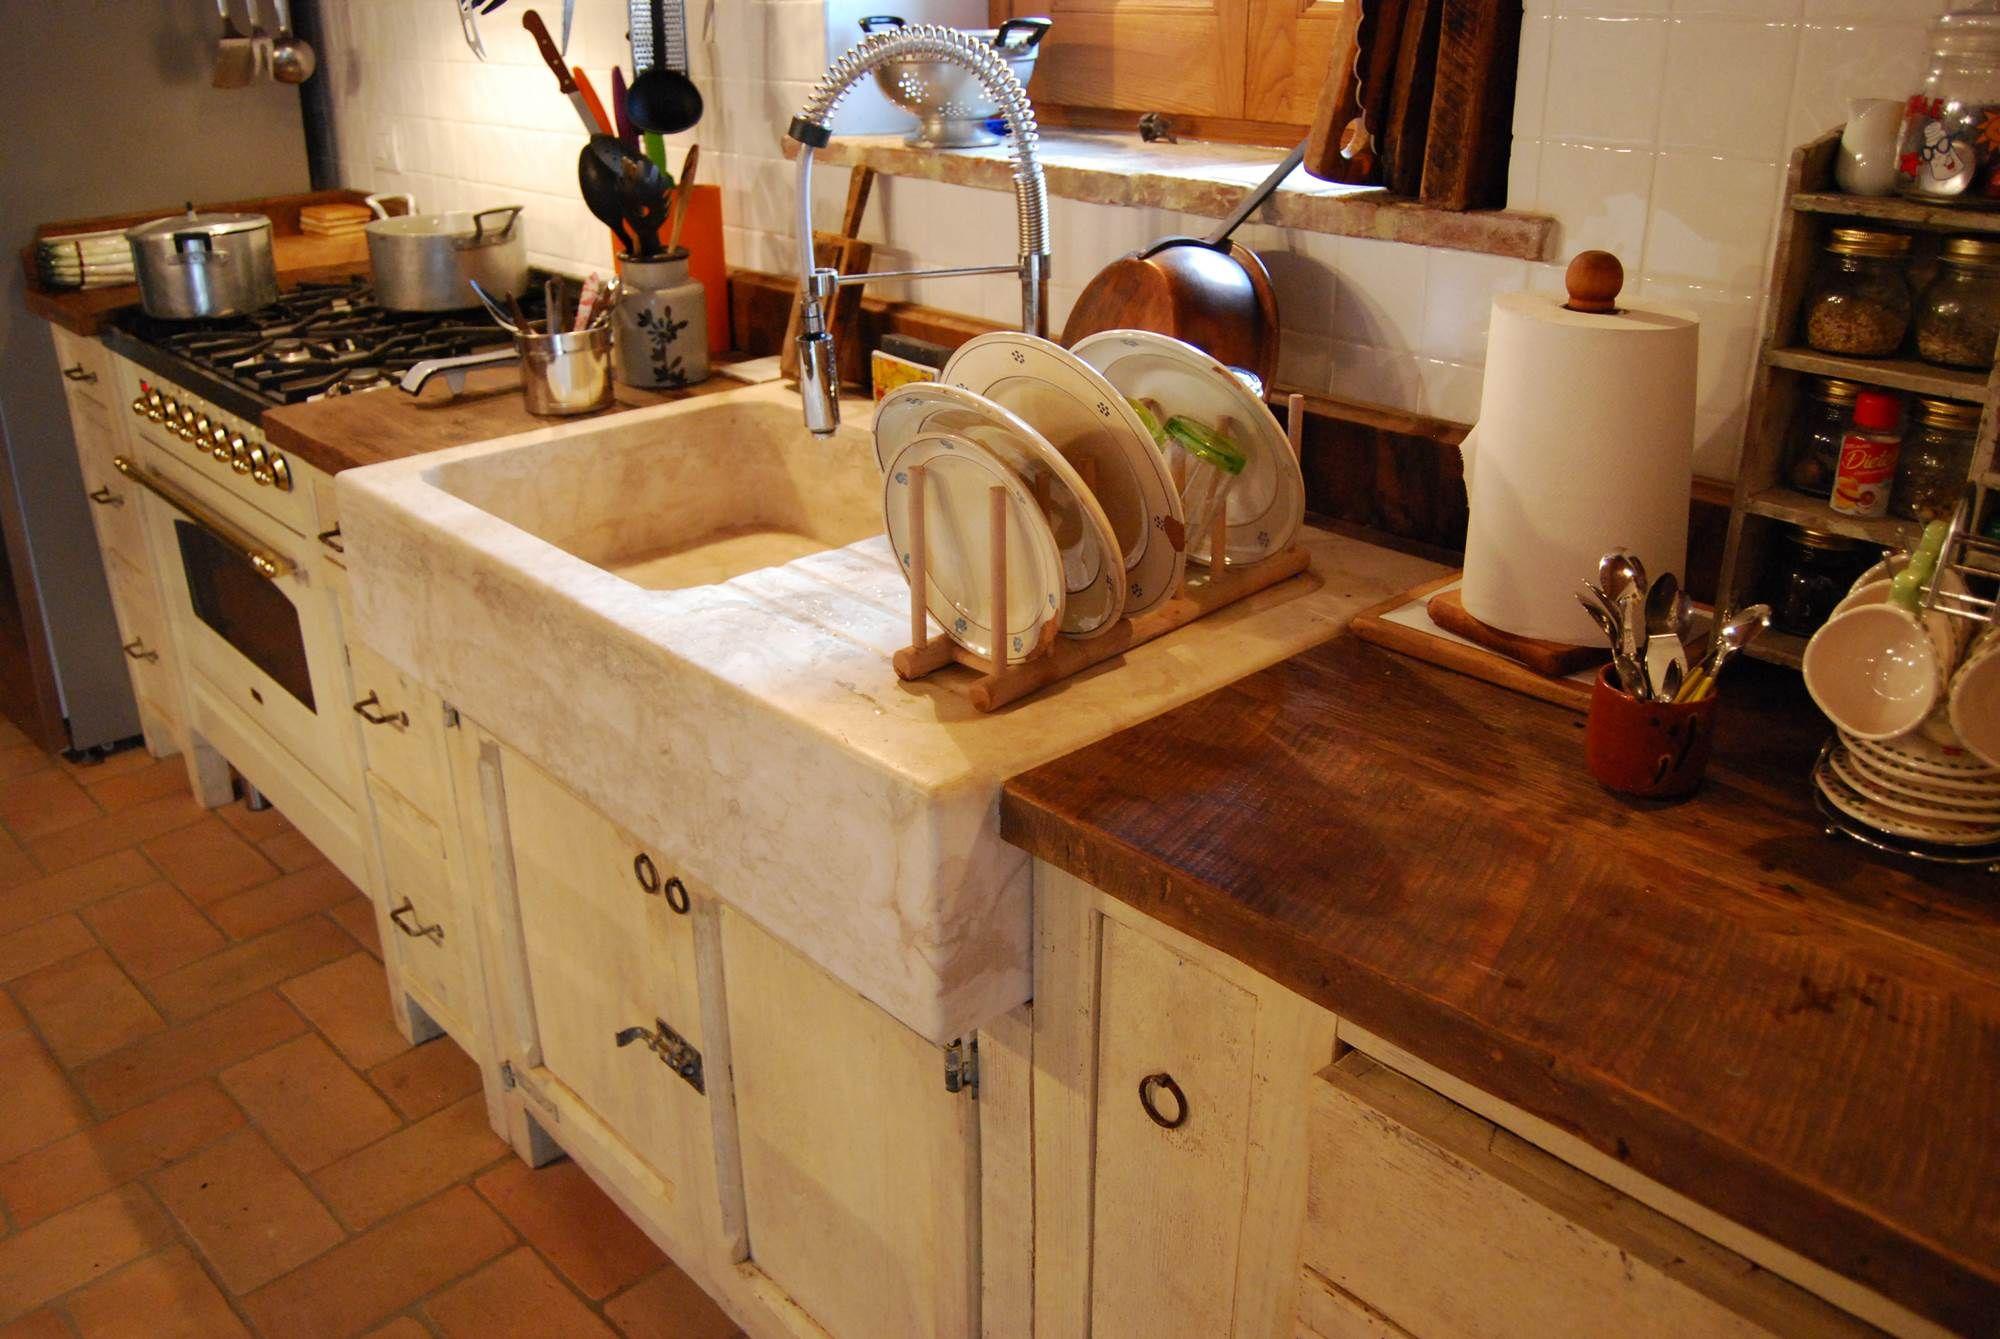 Cucina Provenzale Decapata La Fornace - Cucine Belli | Cucina ...